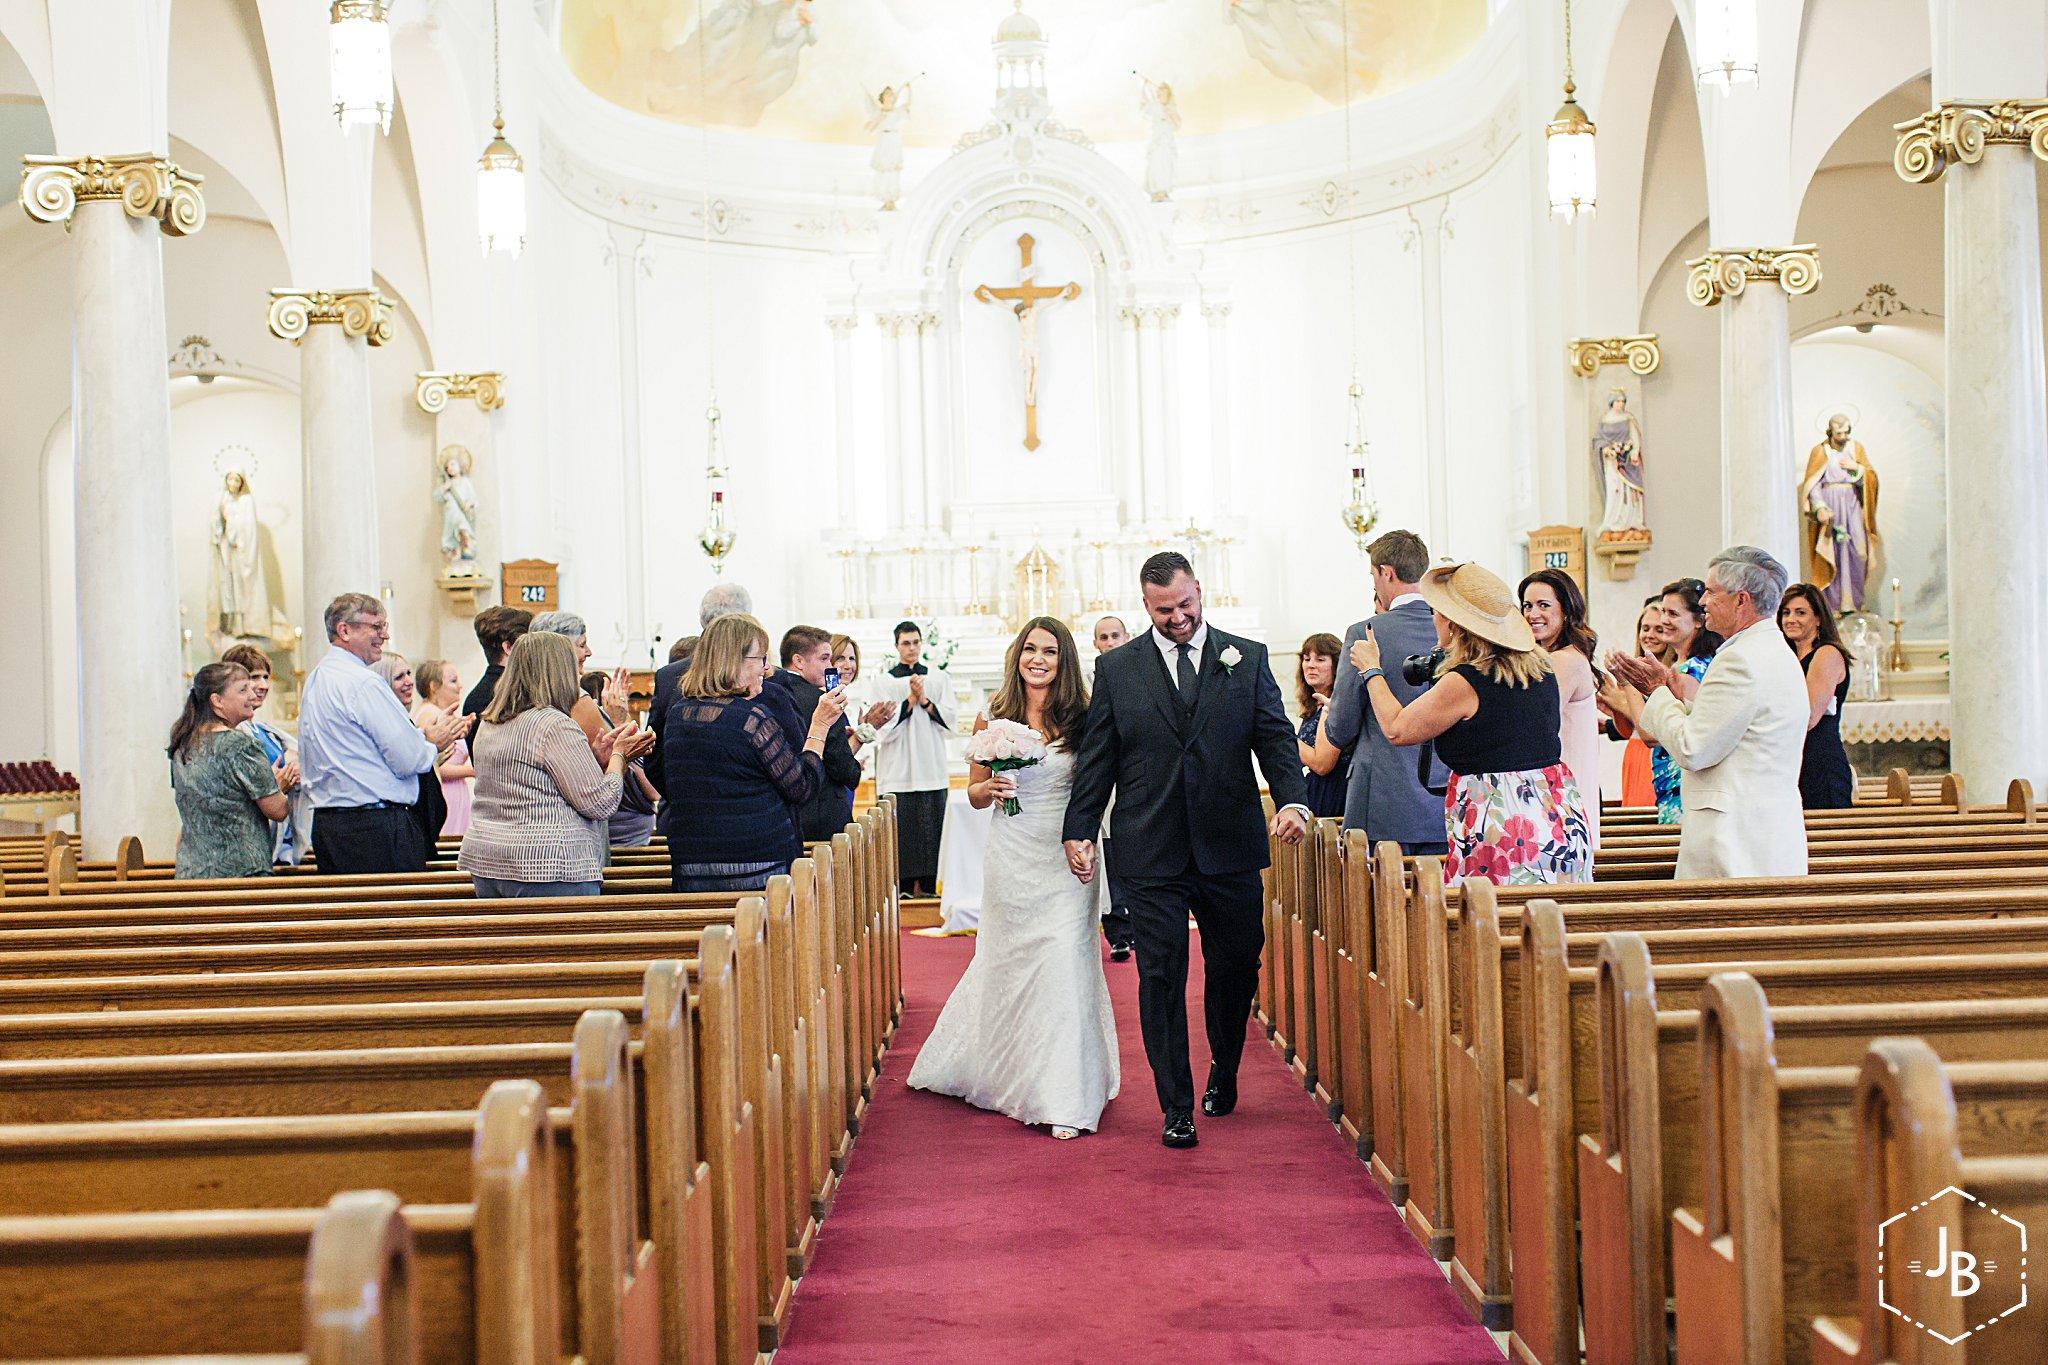 WeddingandEngagementFloridaPhotographer_2915.jpg